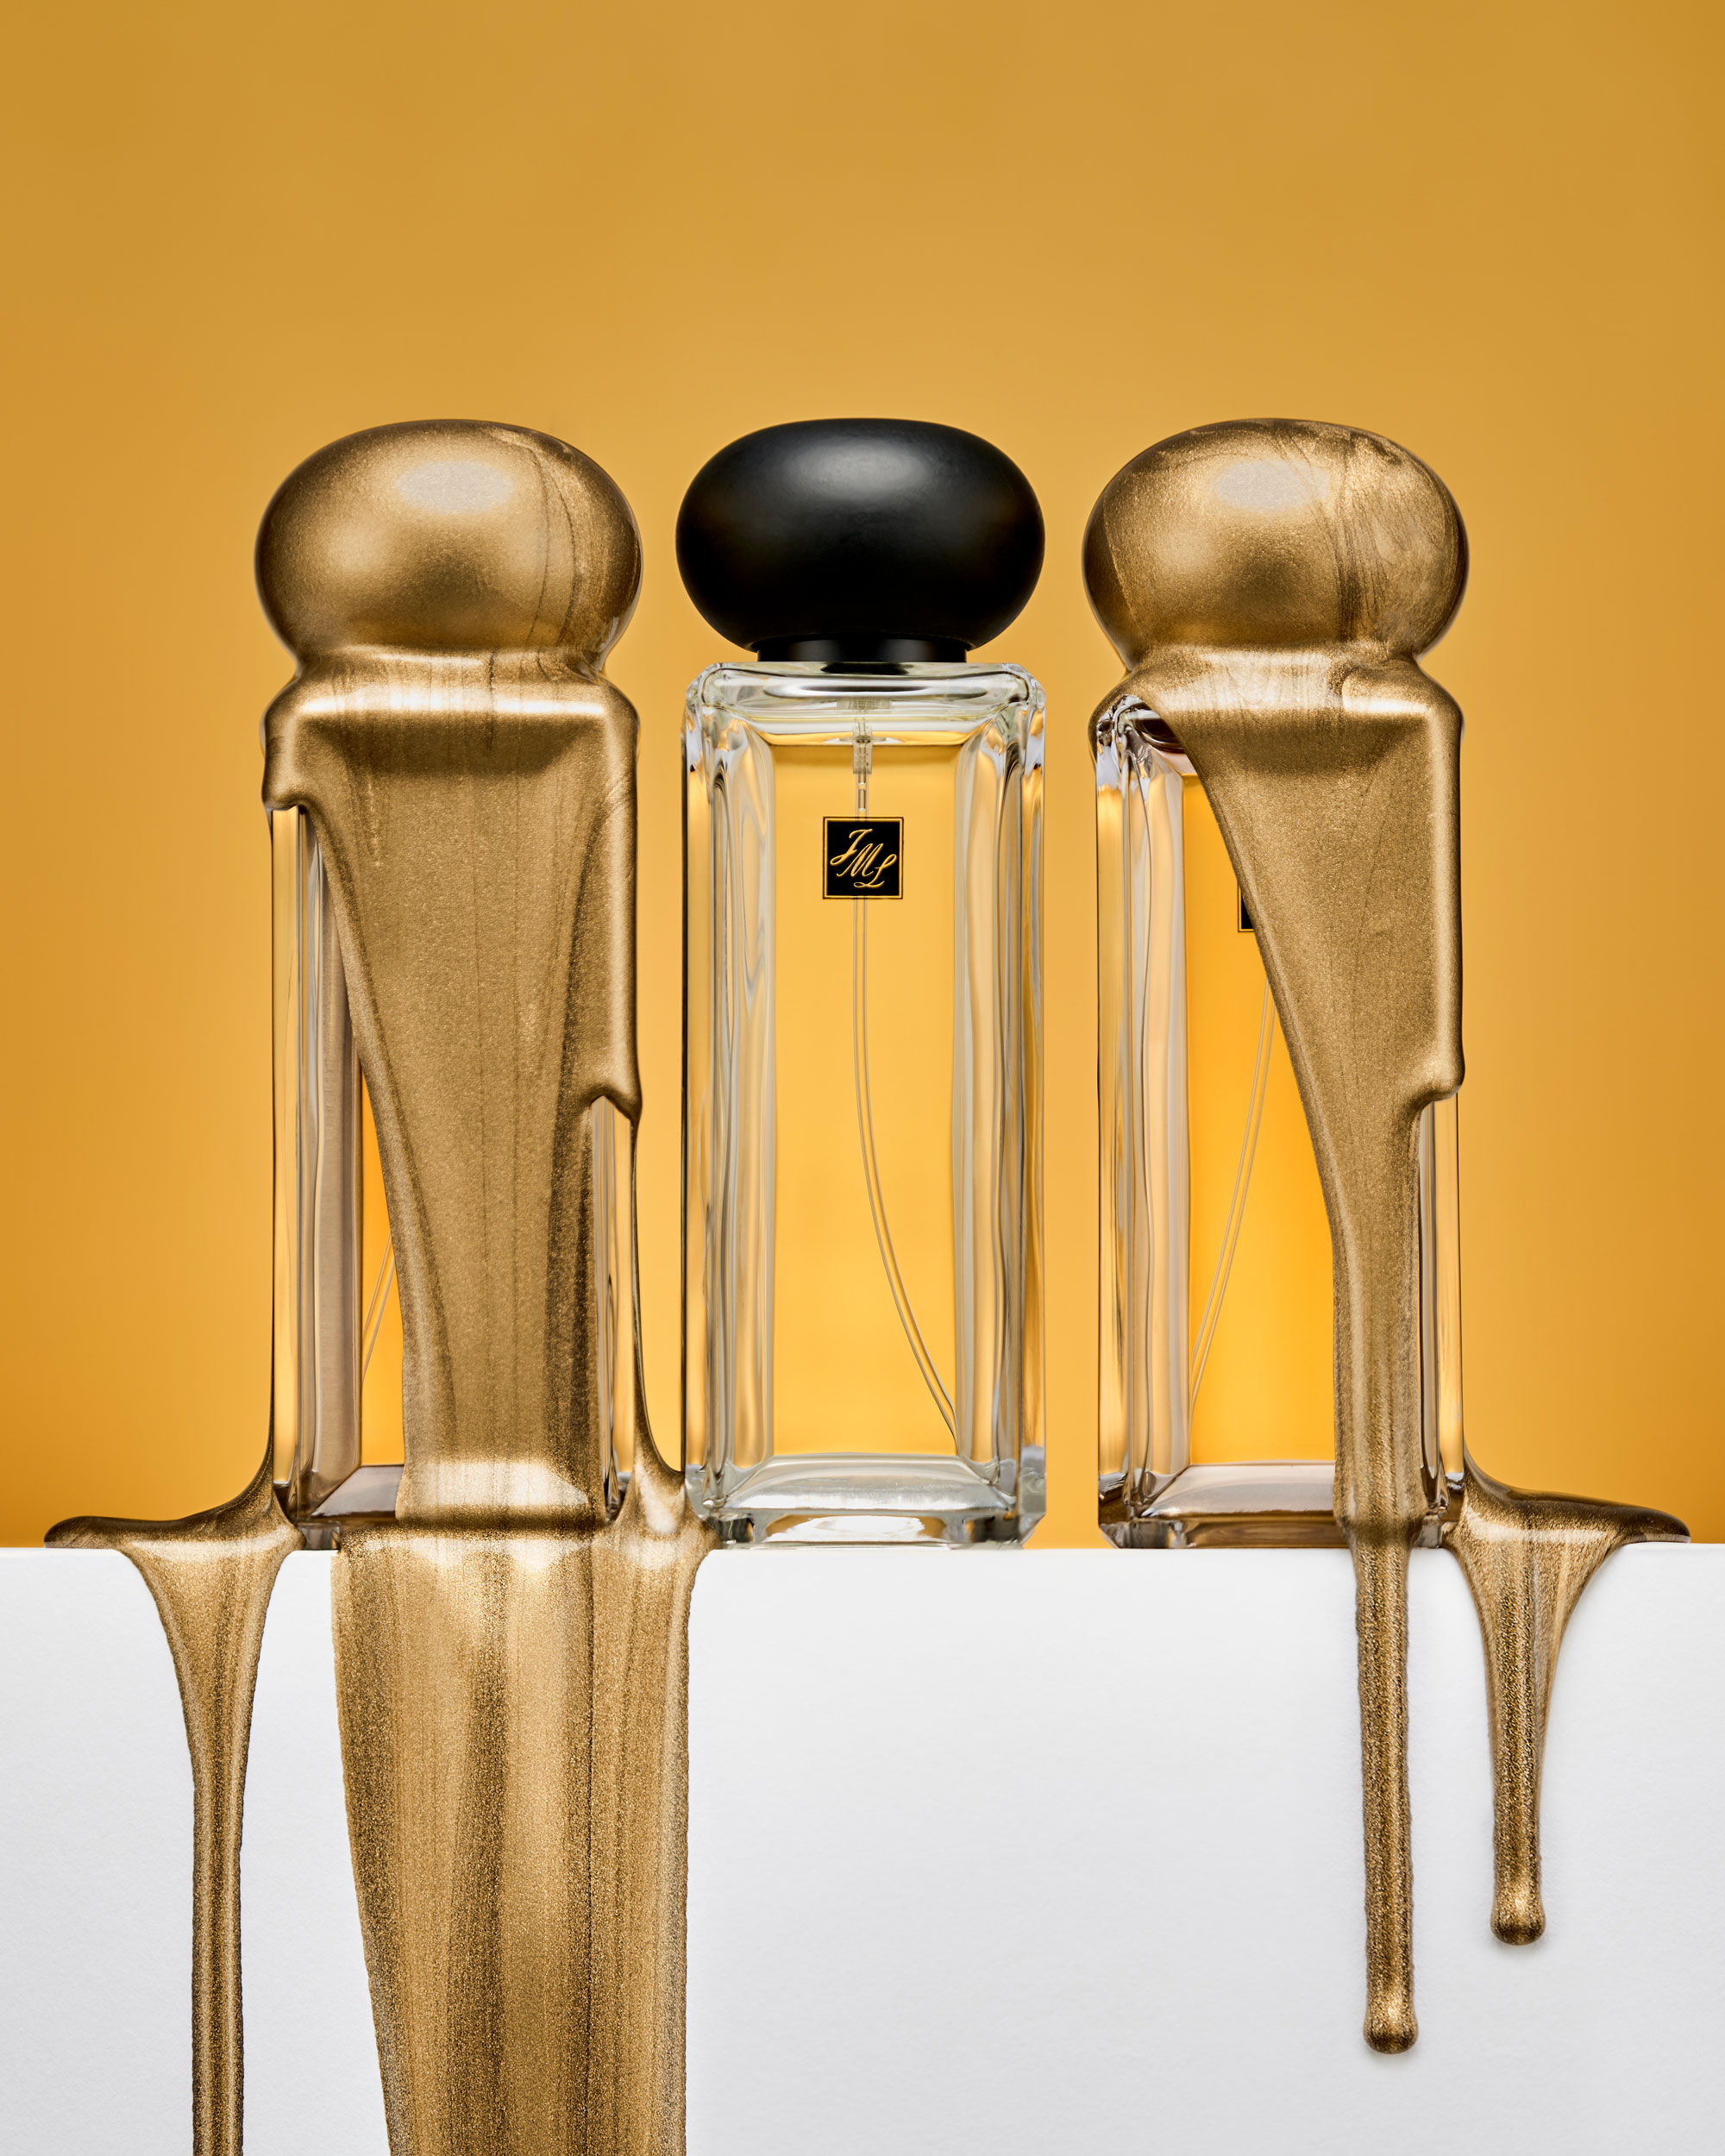 CORP_Corporate_Stores_Golden_Week_September_S02_Golden_Week_Fragrance_2660_4x5_logo_LR